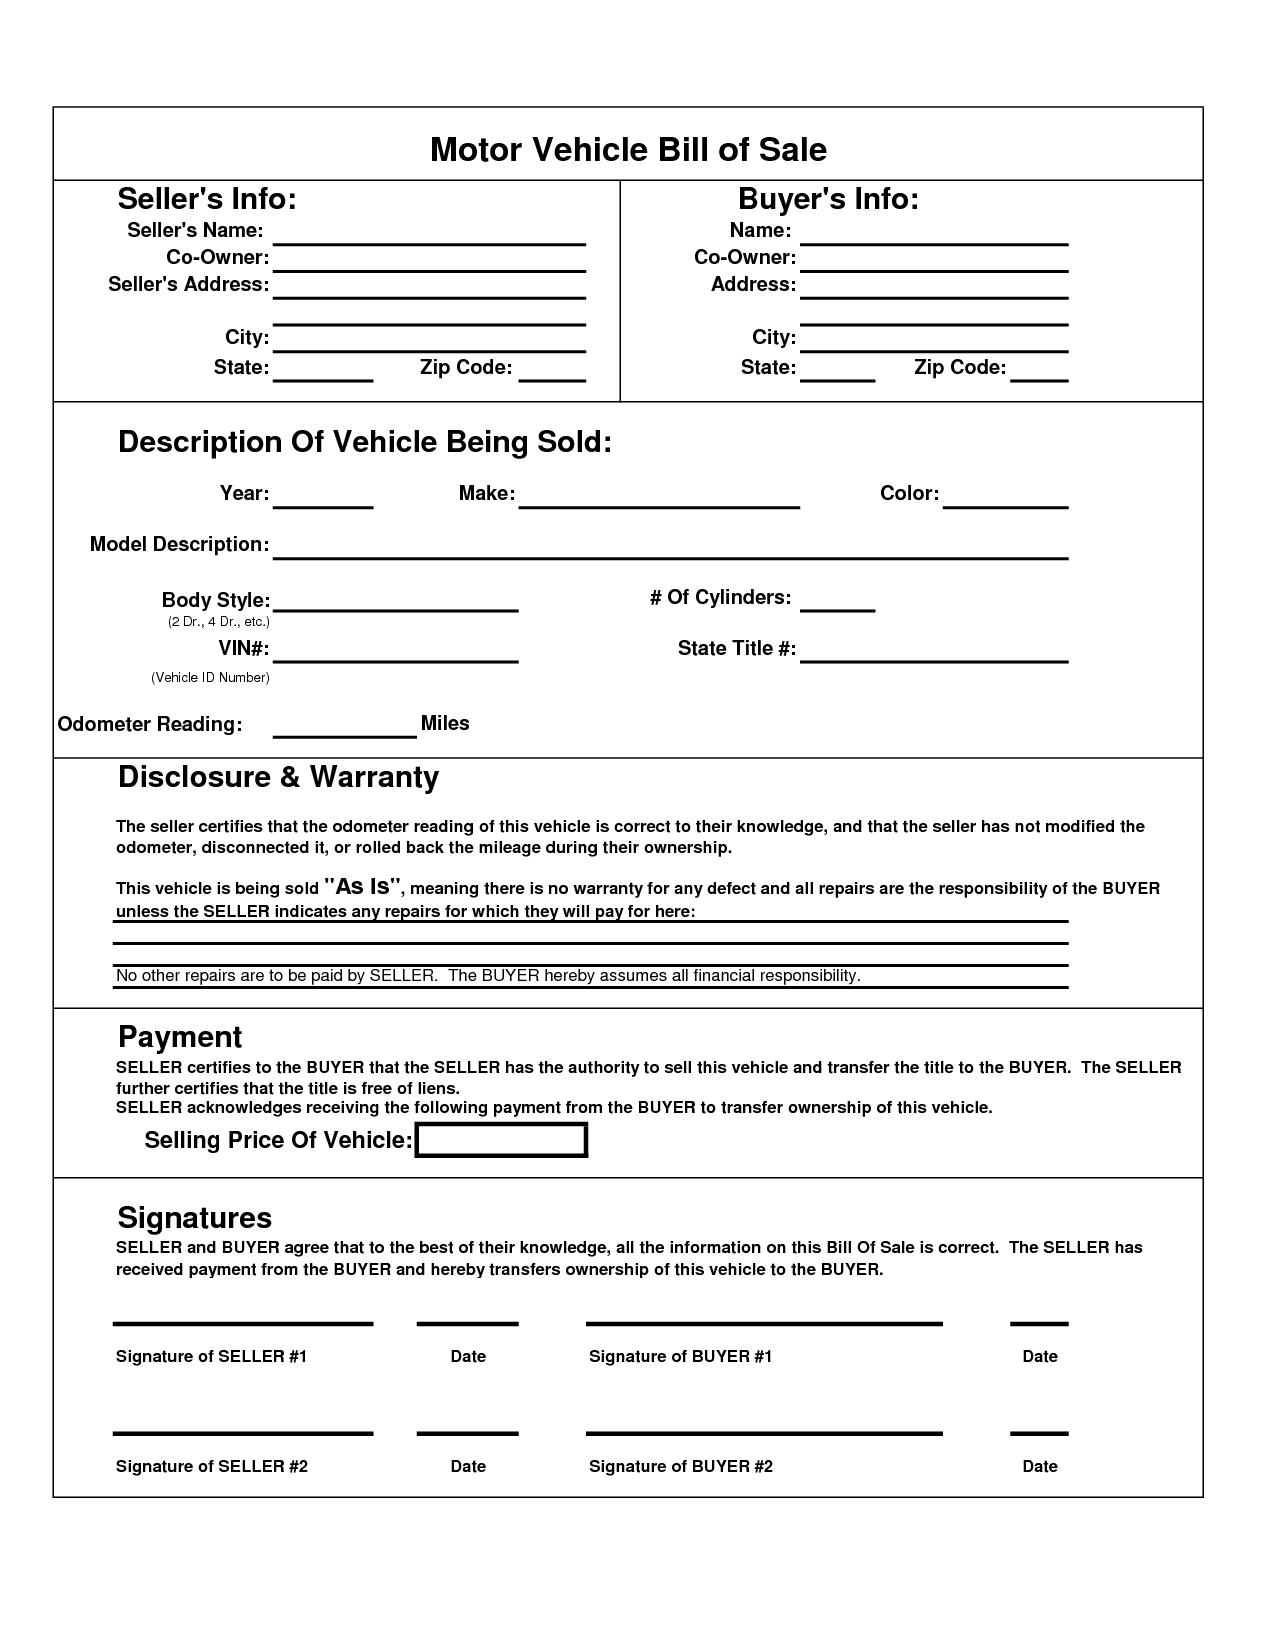 Texas Motor Vehicle Bill Sale Form